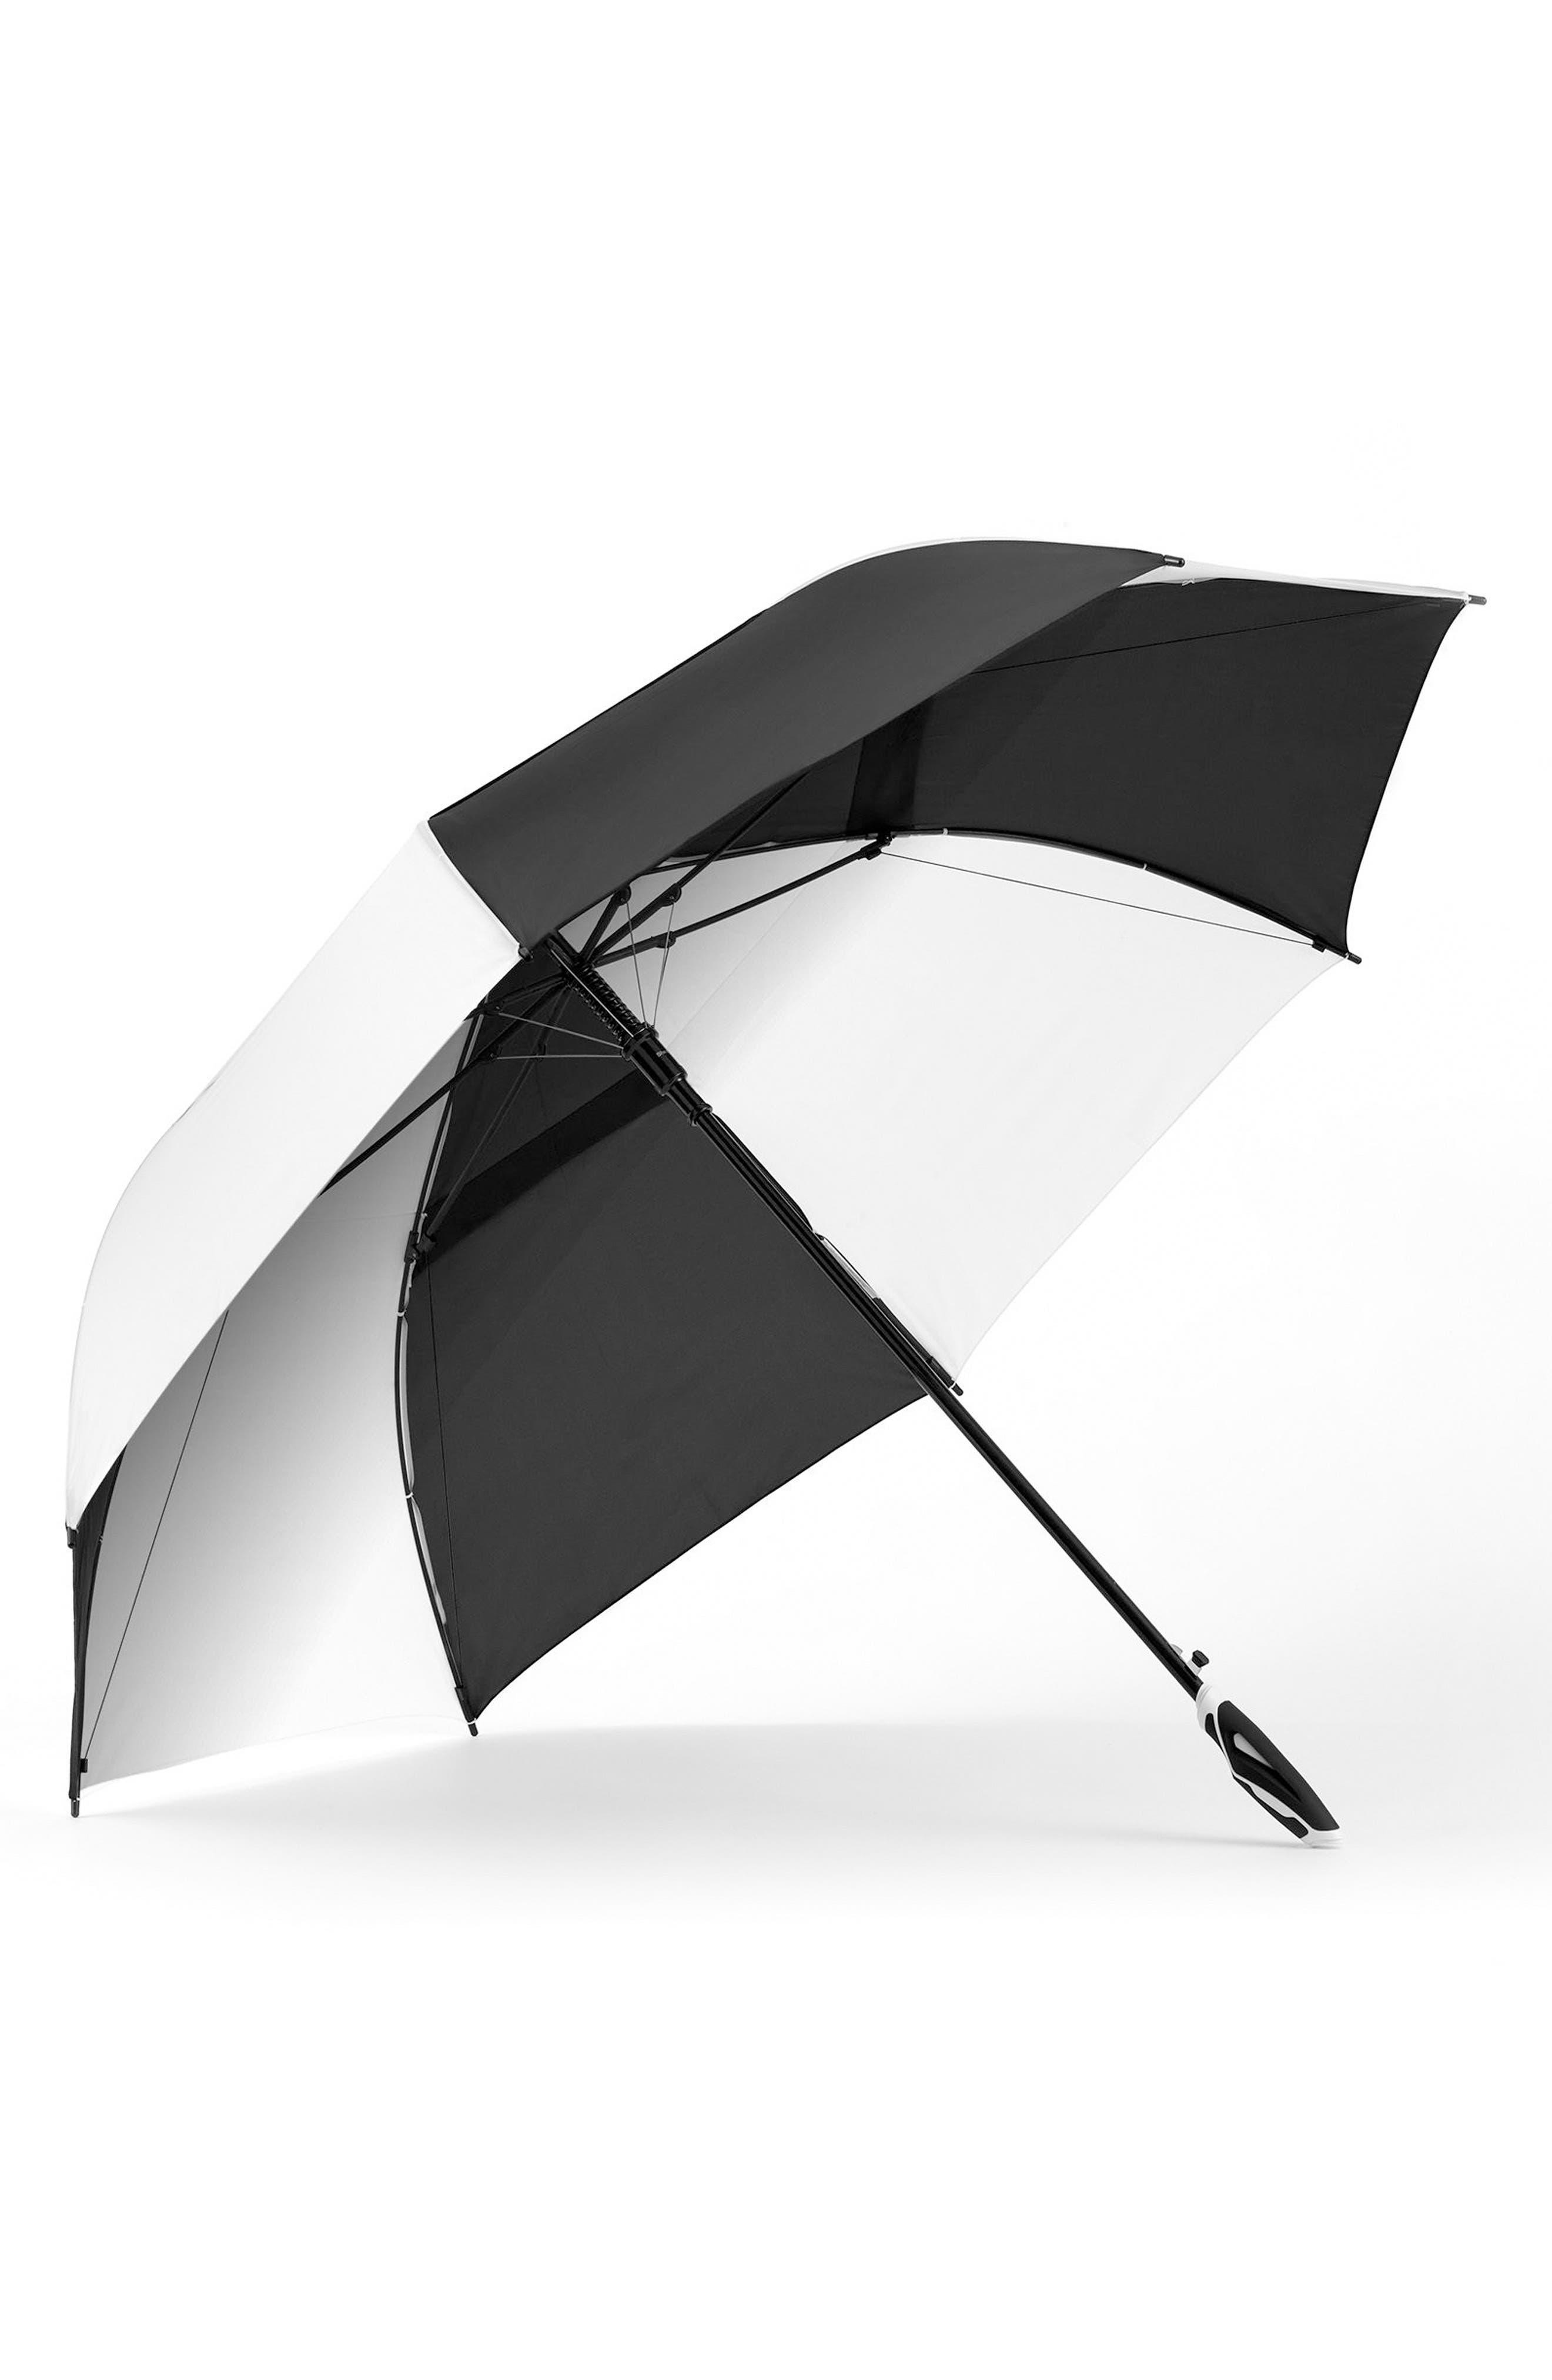 Alternate Image 1 Selected - ShedRain 'WindJammer®' Auto Open Golf Umbrella